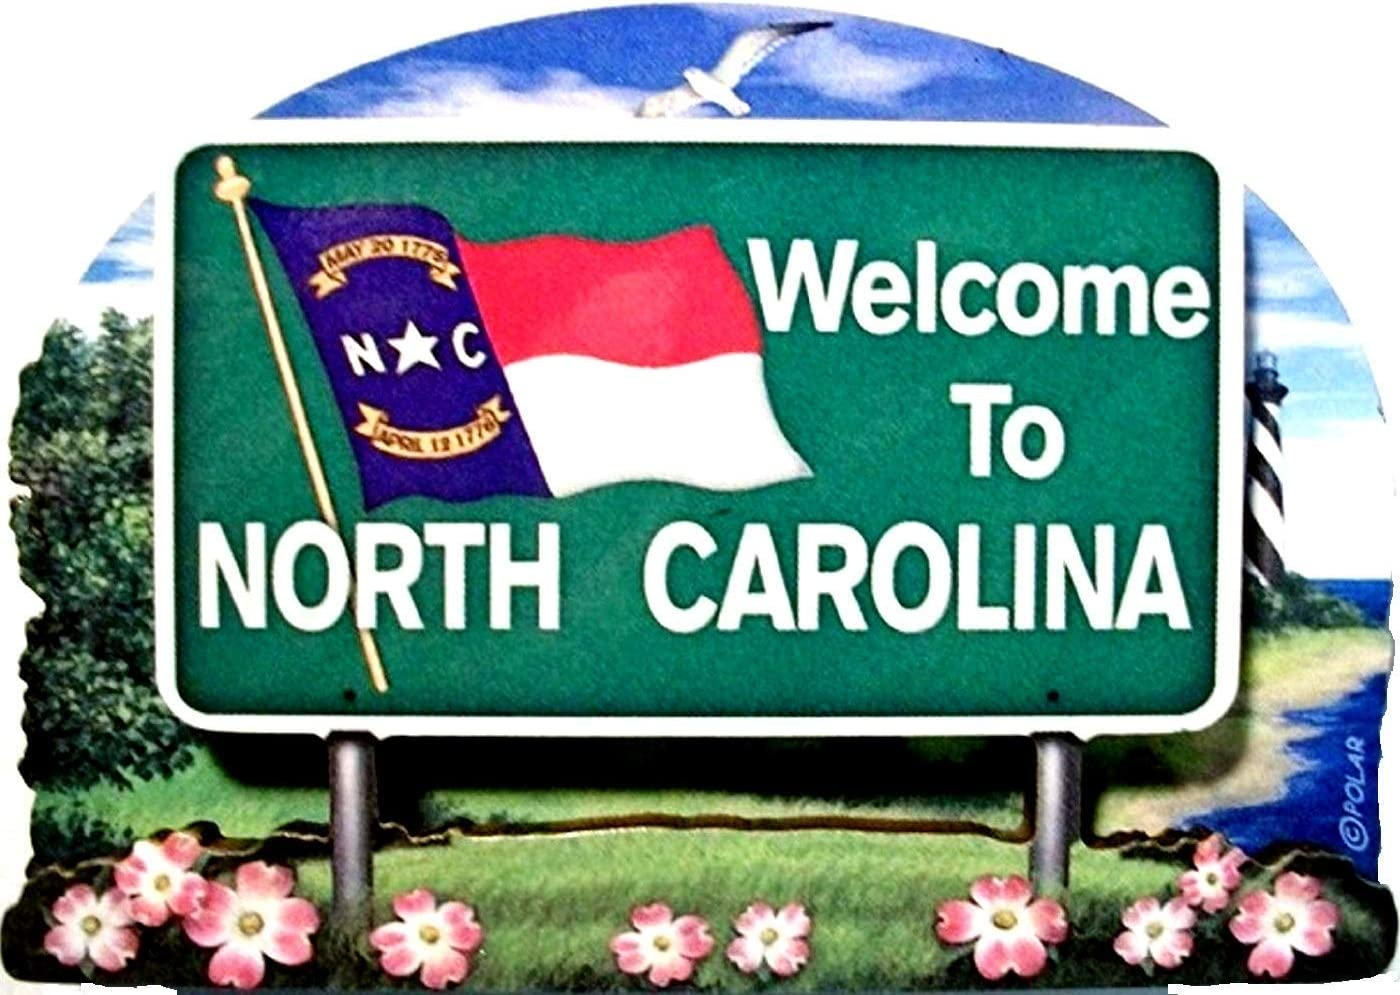 North Carolina State Welcome Sign Wood Fridge Magnet